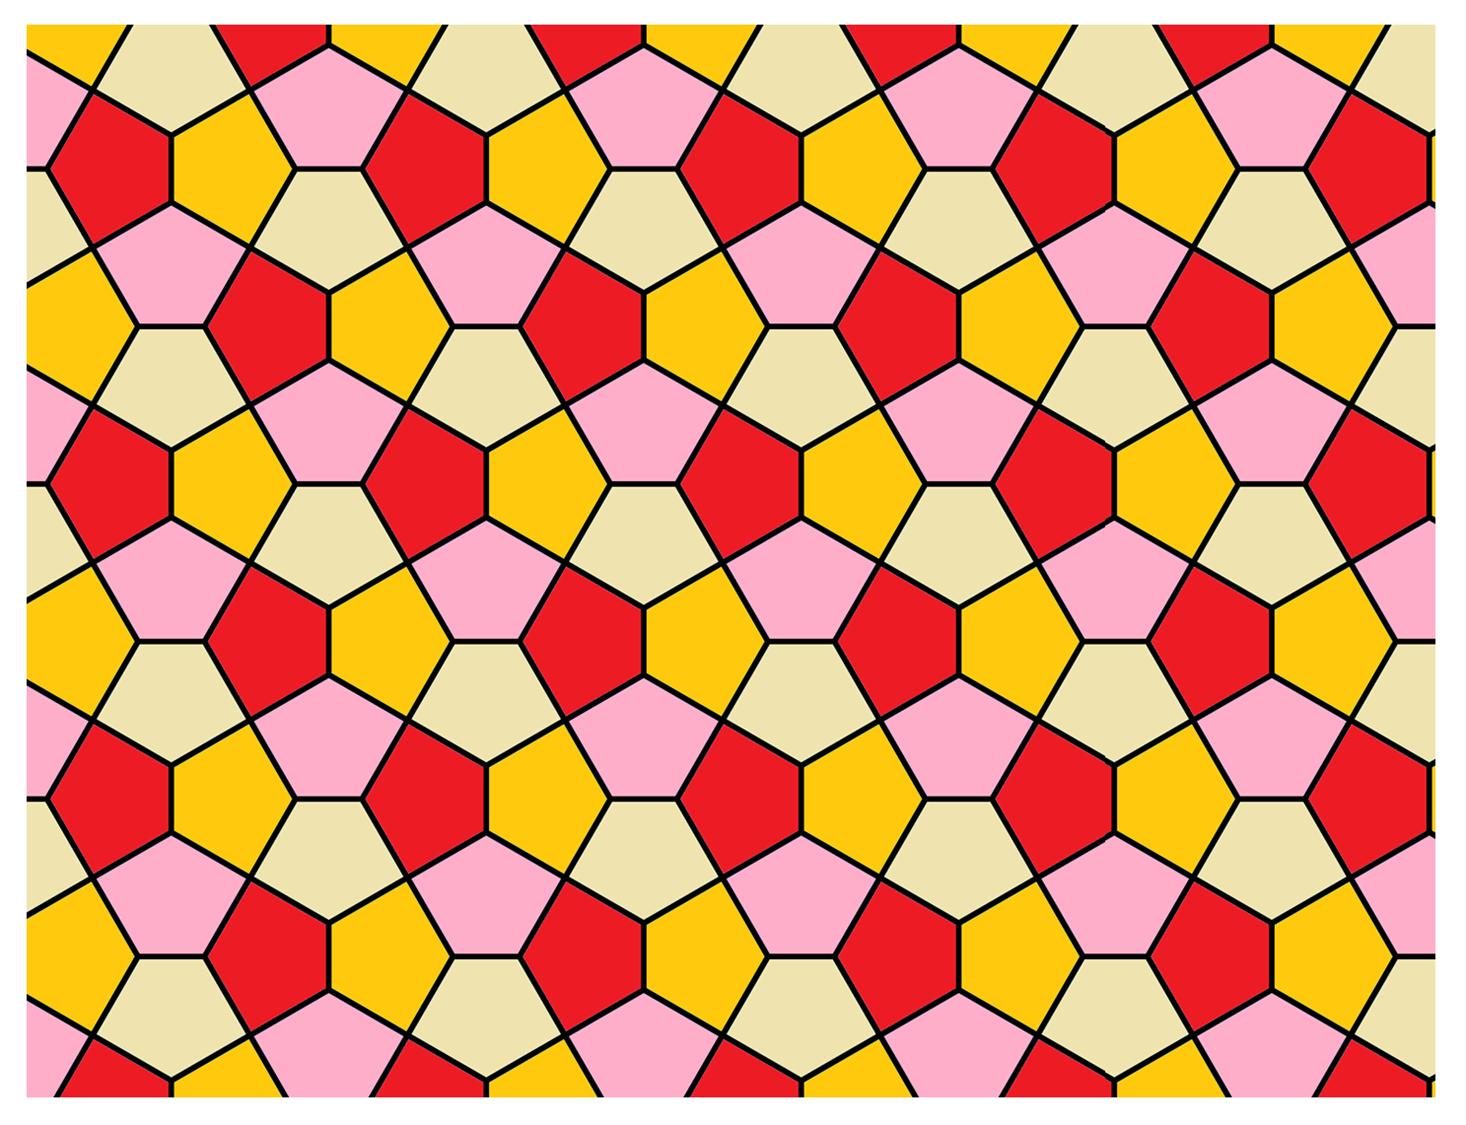 Cairo Pentagon Tilings